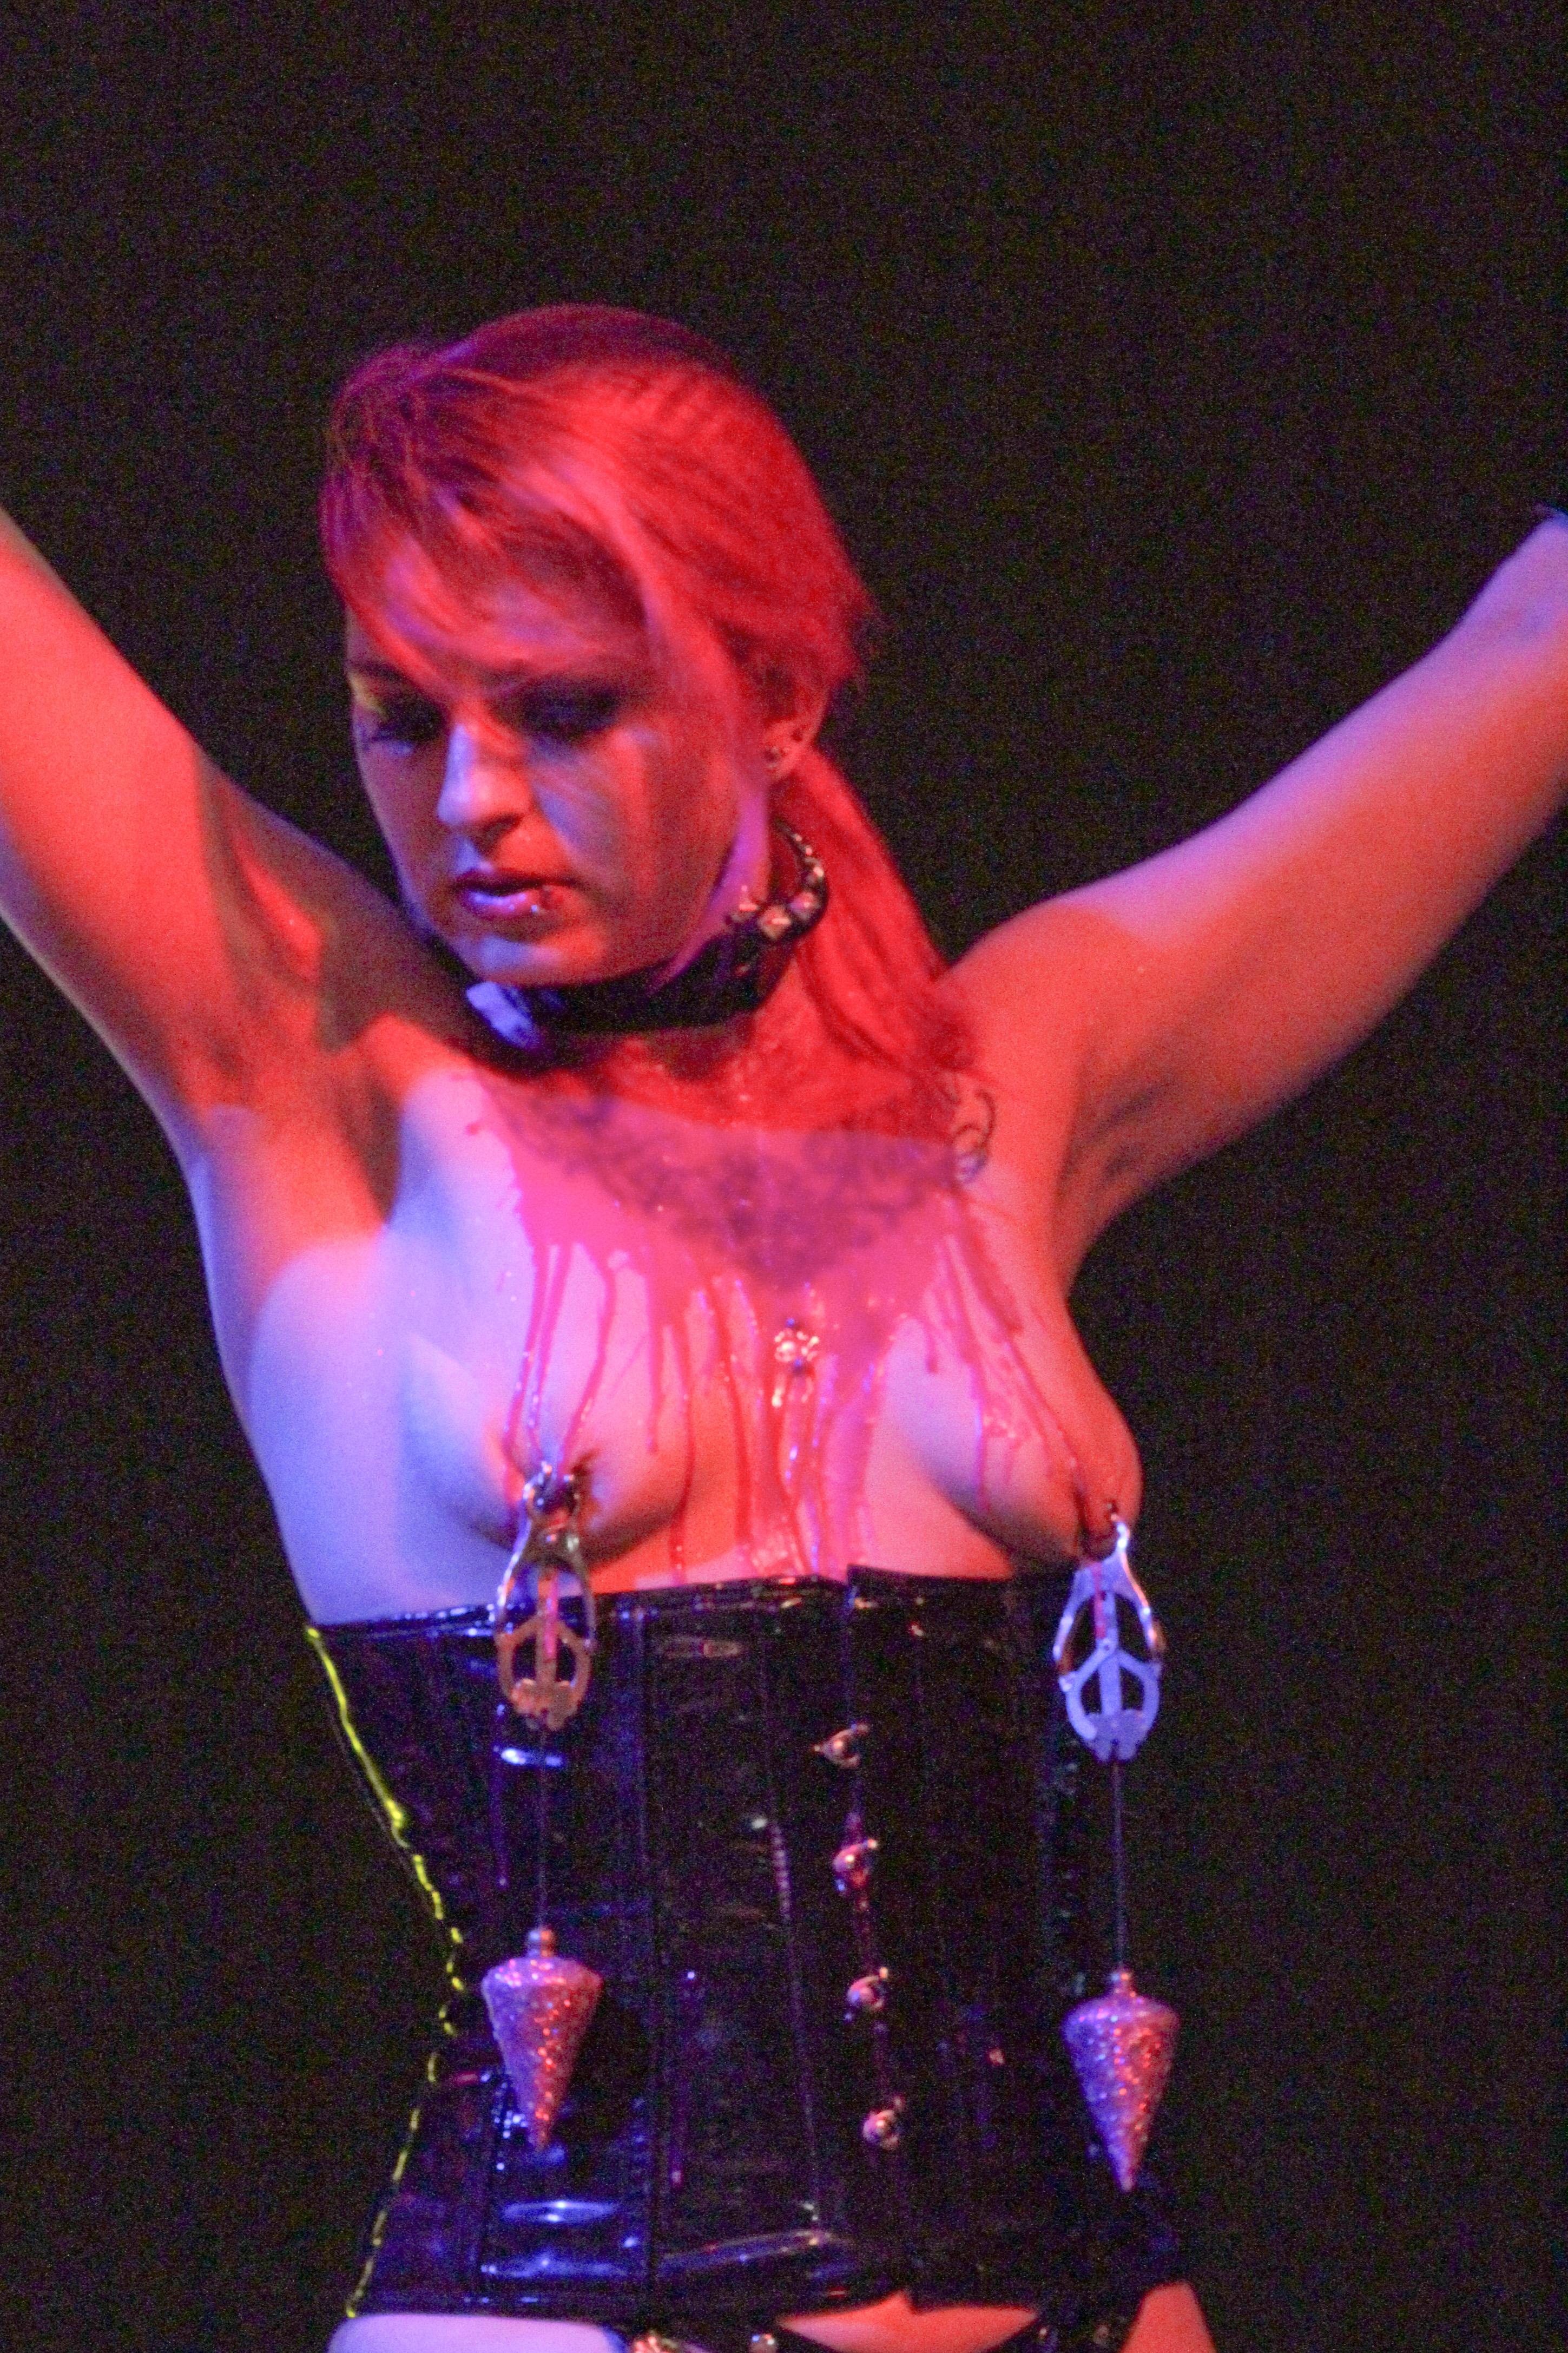 Bdsm play date for shackled brunette and master